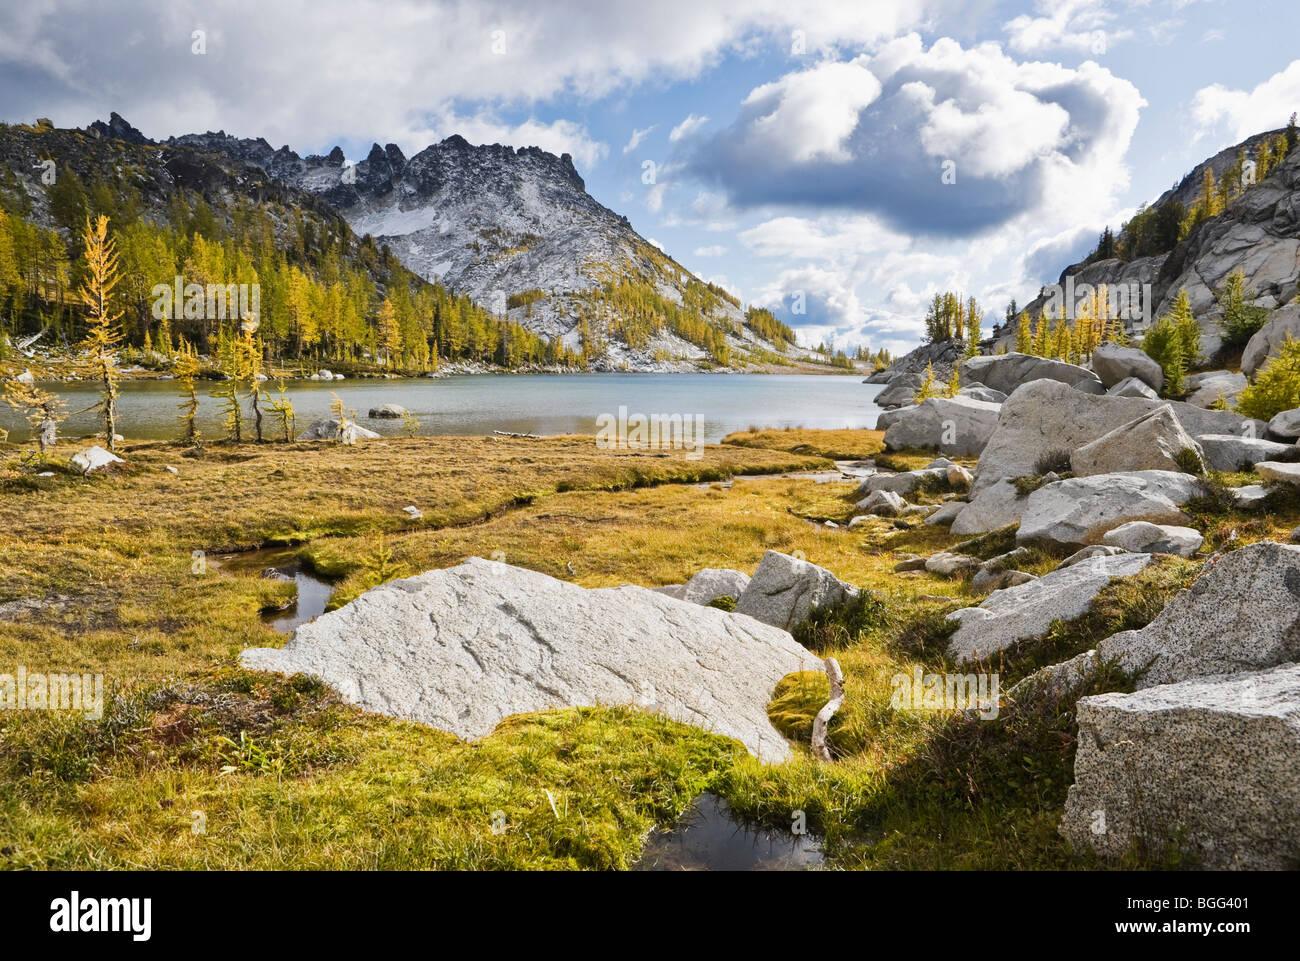 Perfección Lago y pico McClellan, encanto Área Silvestre de lagos, cascadas de Washington, Estados Unidos. Imagen De Stock